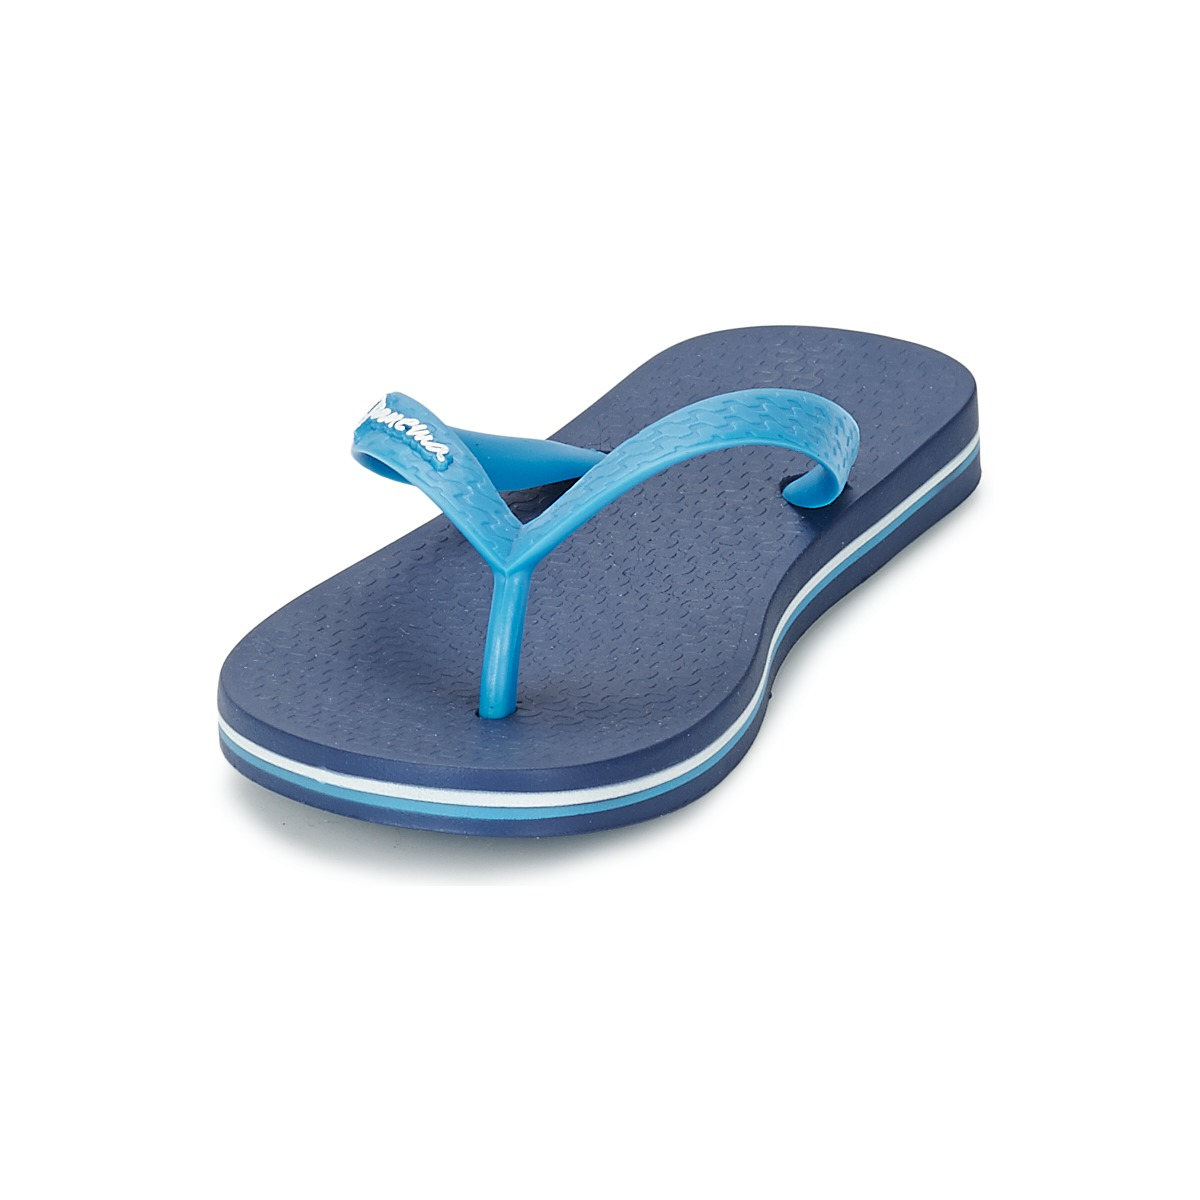 ipanema flip flops ipanema classica brasil ii ad blue blue. Black Bedroom Furniture Sets. Home Design Ideas